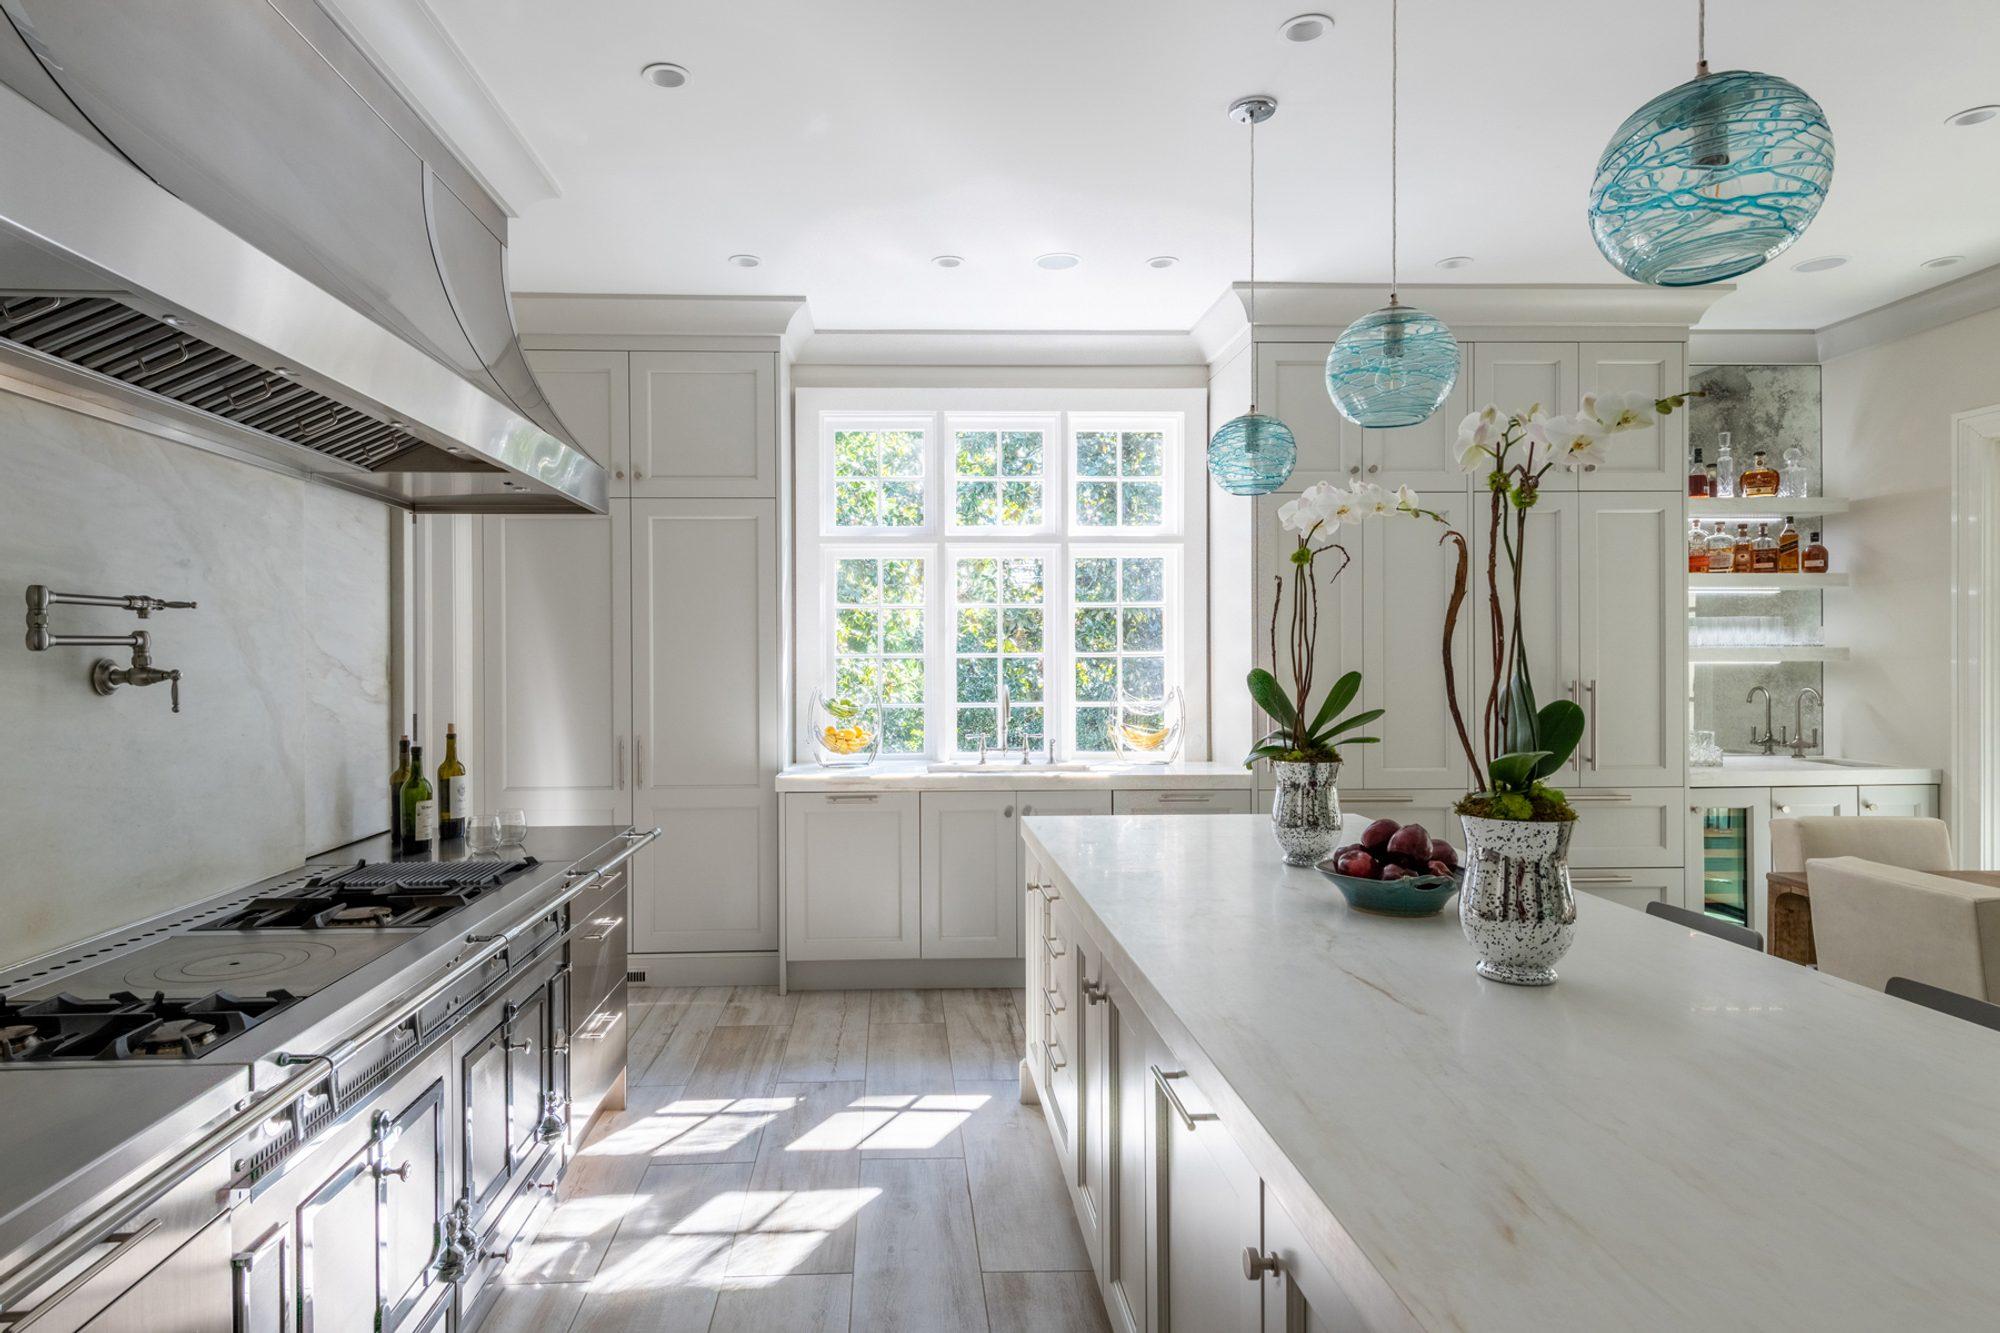 beautiful kitchen quartz solid backsplash and countertops tile floors white cabinets